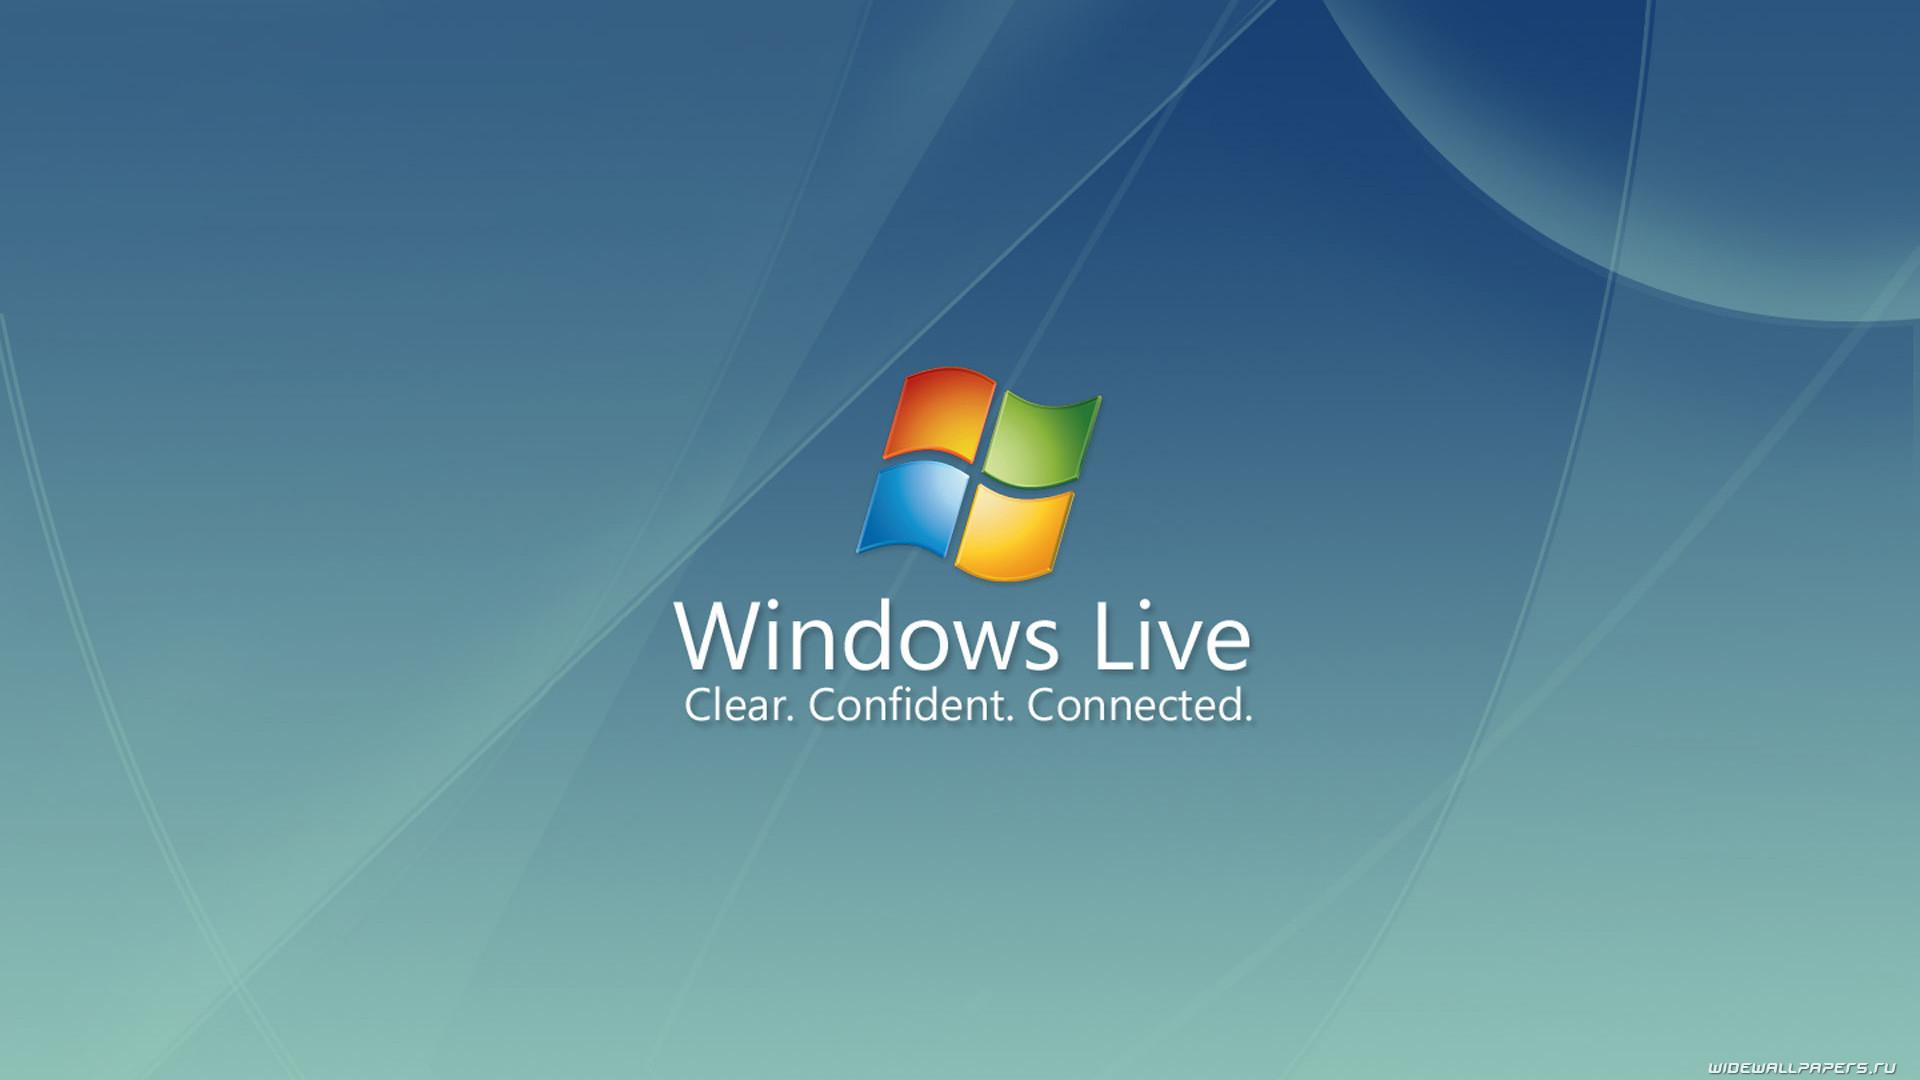 Aquarium Live Wallpaper For Windows Free Download : Live wallpapers for windows  10 wallpapersafari